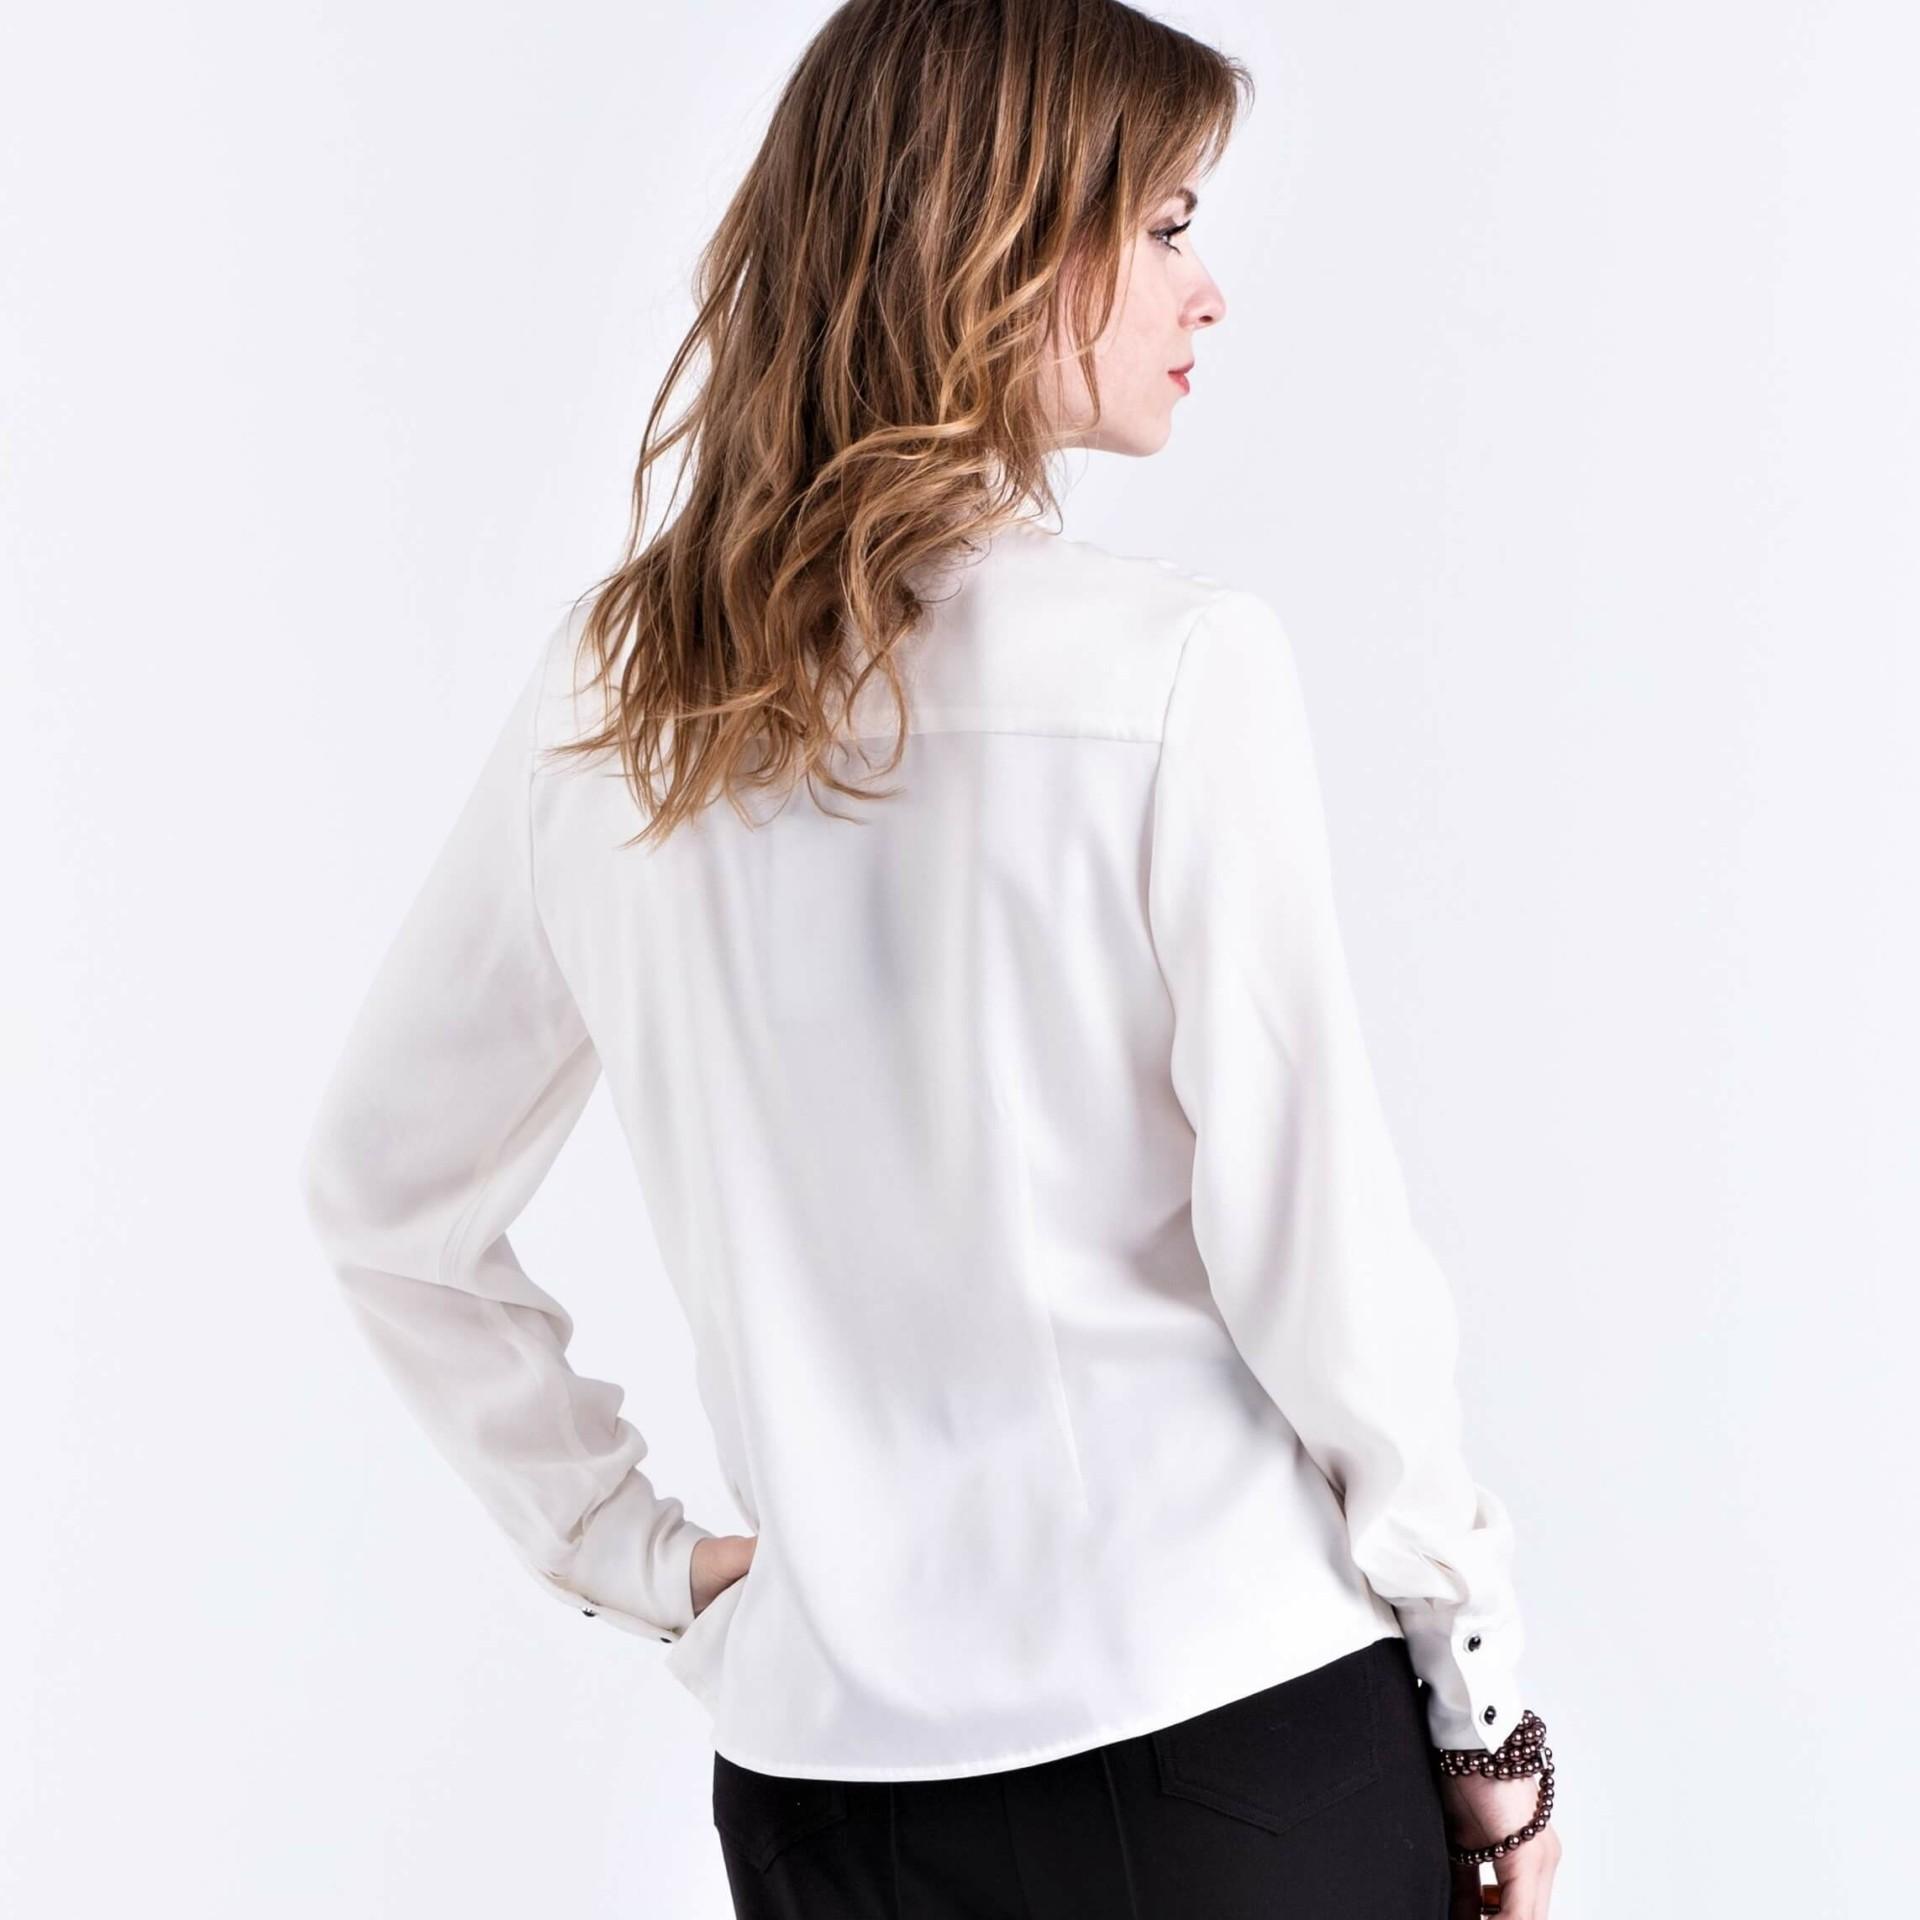 Betere Zijde blouse-shirt met pailletten | AXELLES Fashion UF-08